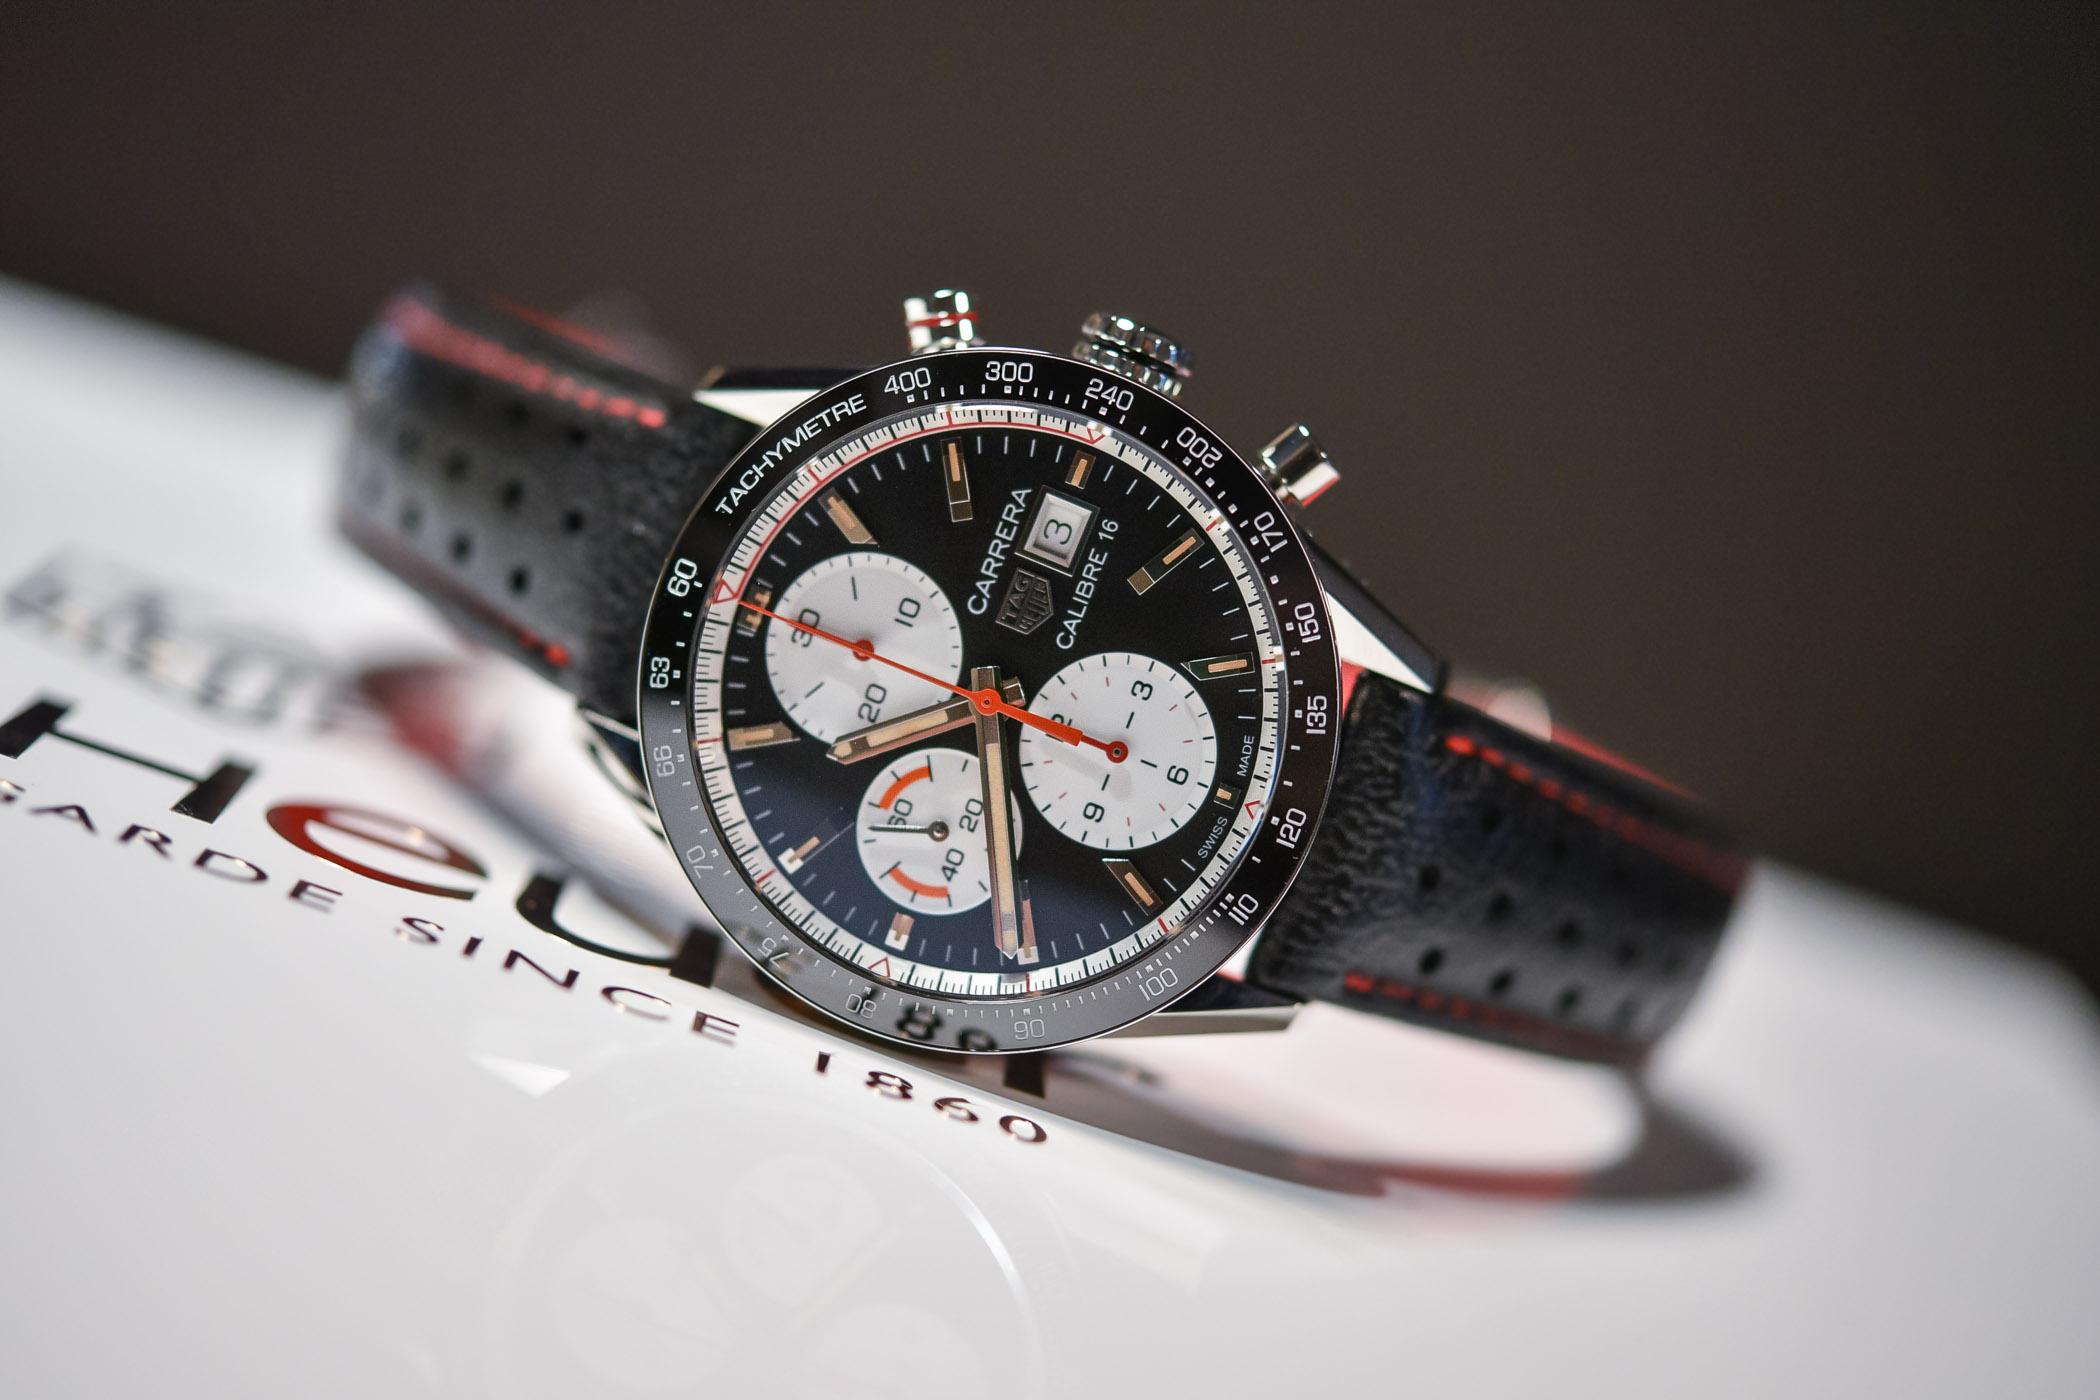 The Most Successful TAG Heuer Carrera Calibre 16 Chronograph